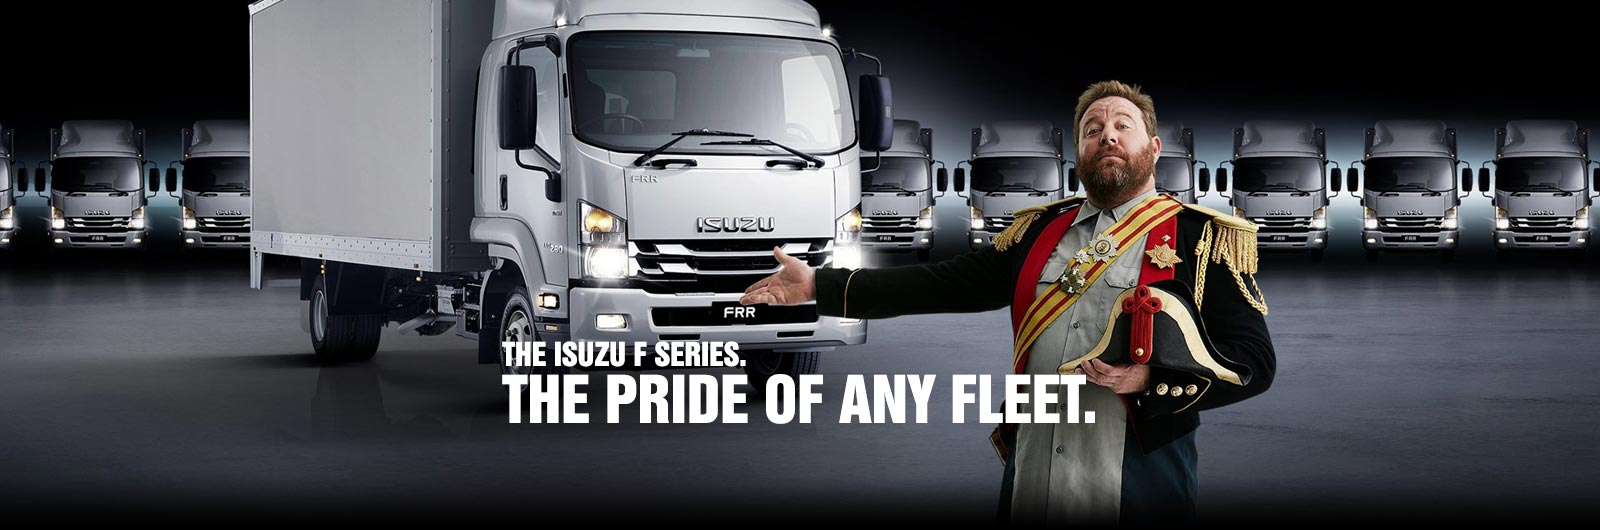 The pride of any fleet